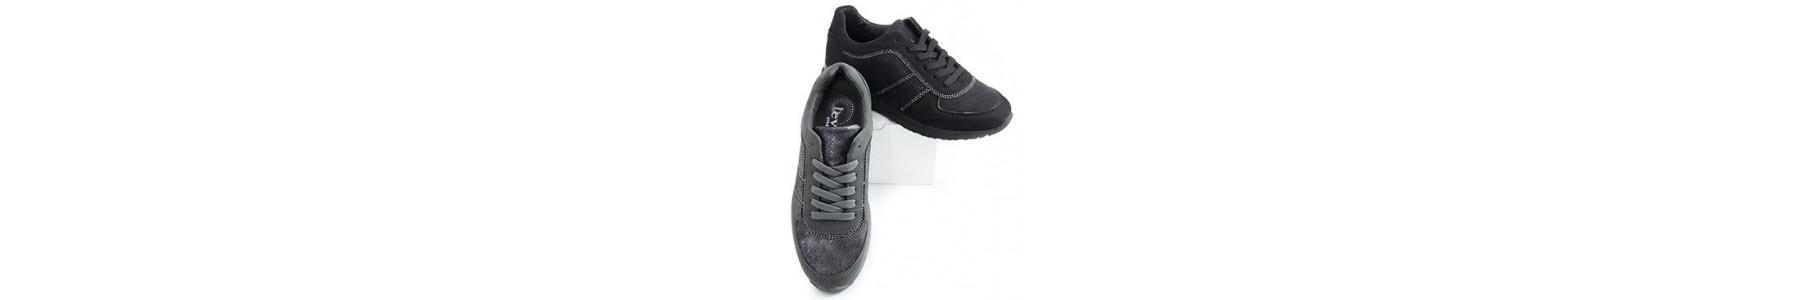 Orthopaedic Shoes